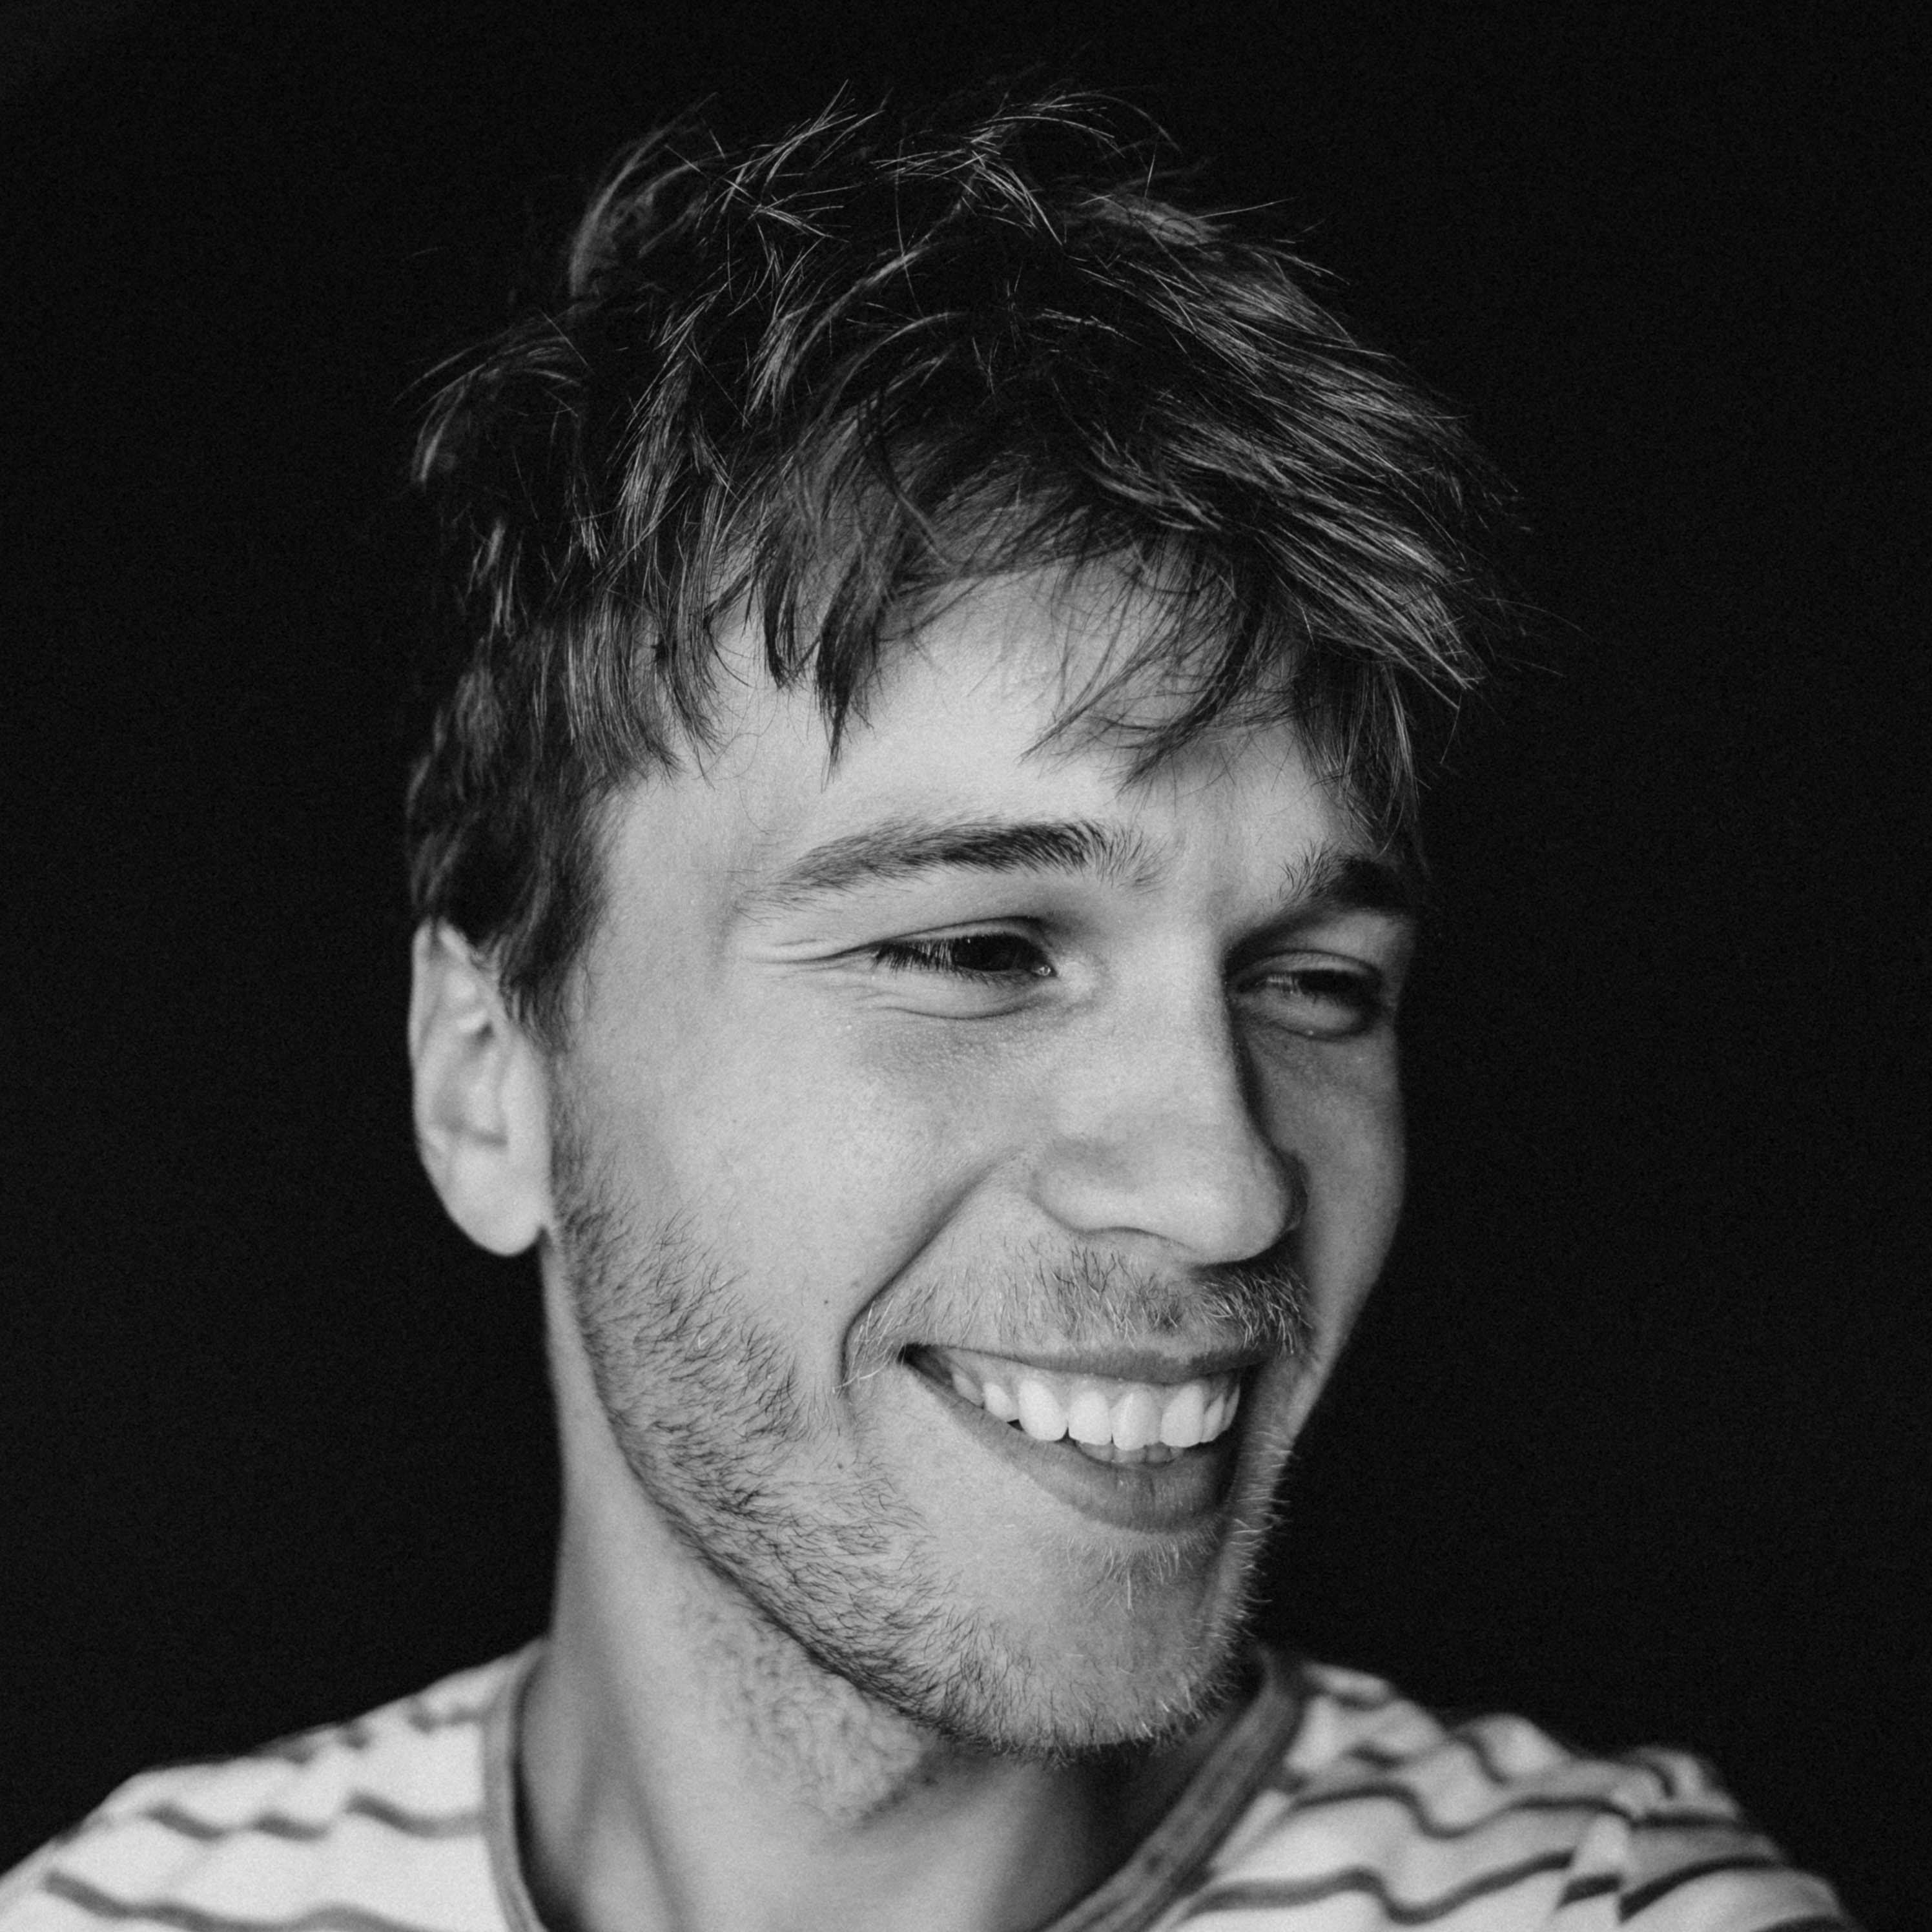 Tobias Kebernik